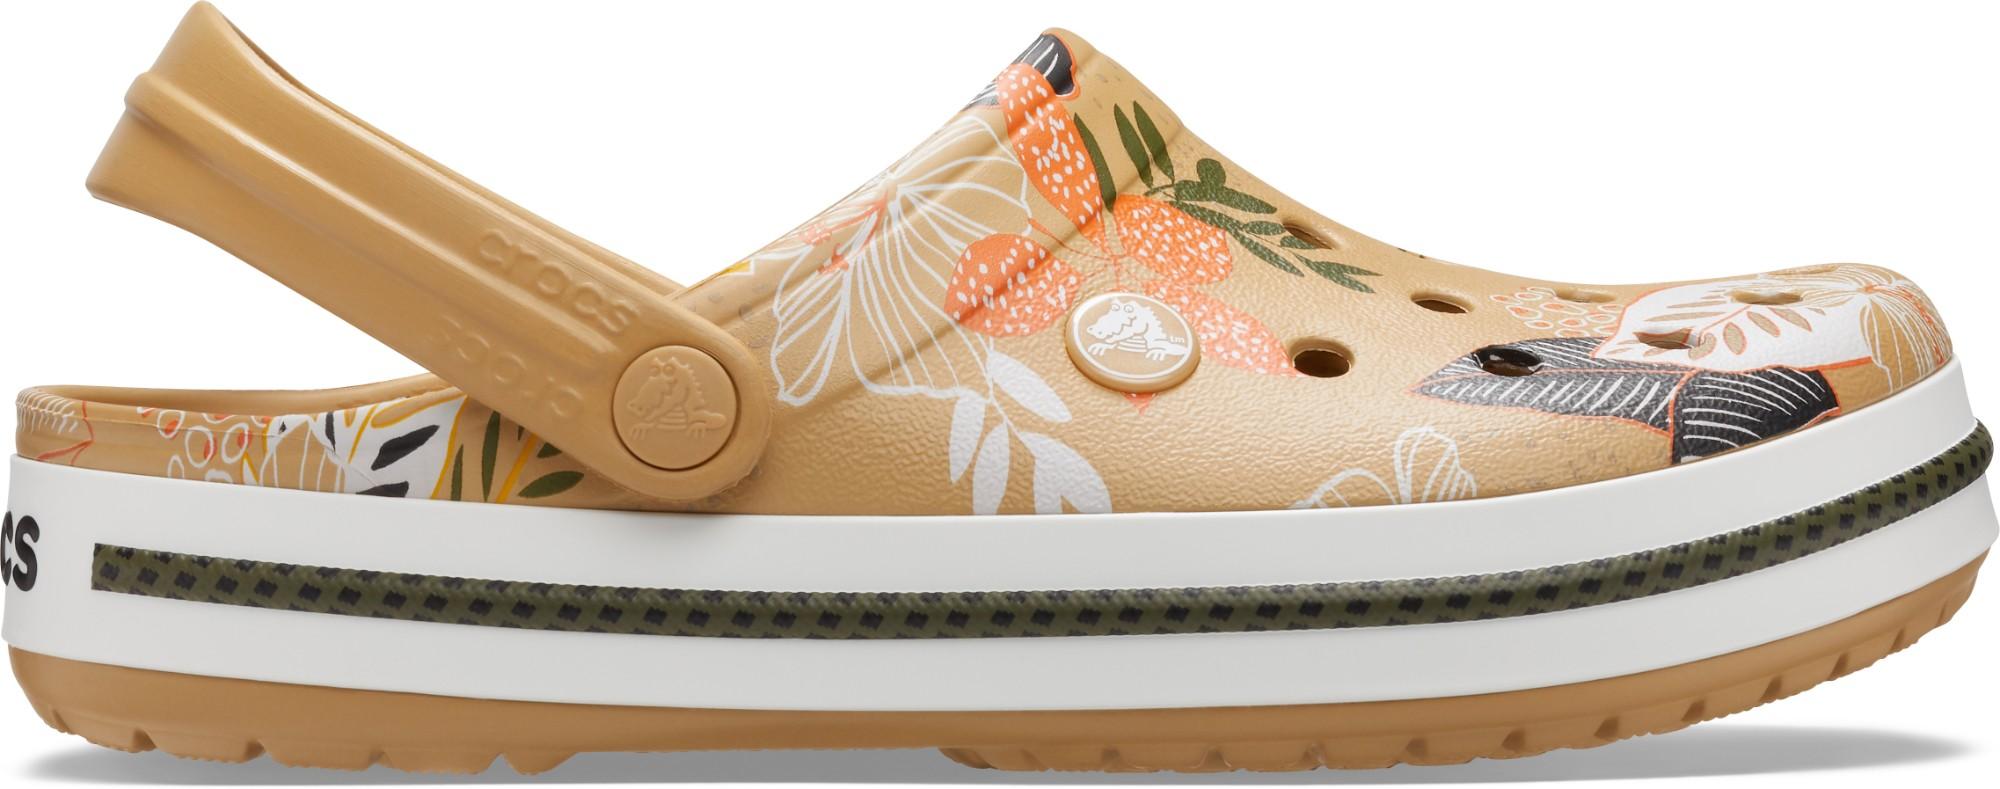 Crocs™ Crocband Botanical Print Clog Tan/White 36,5